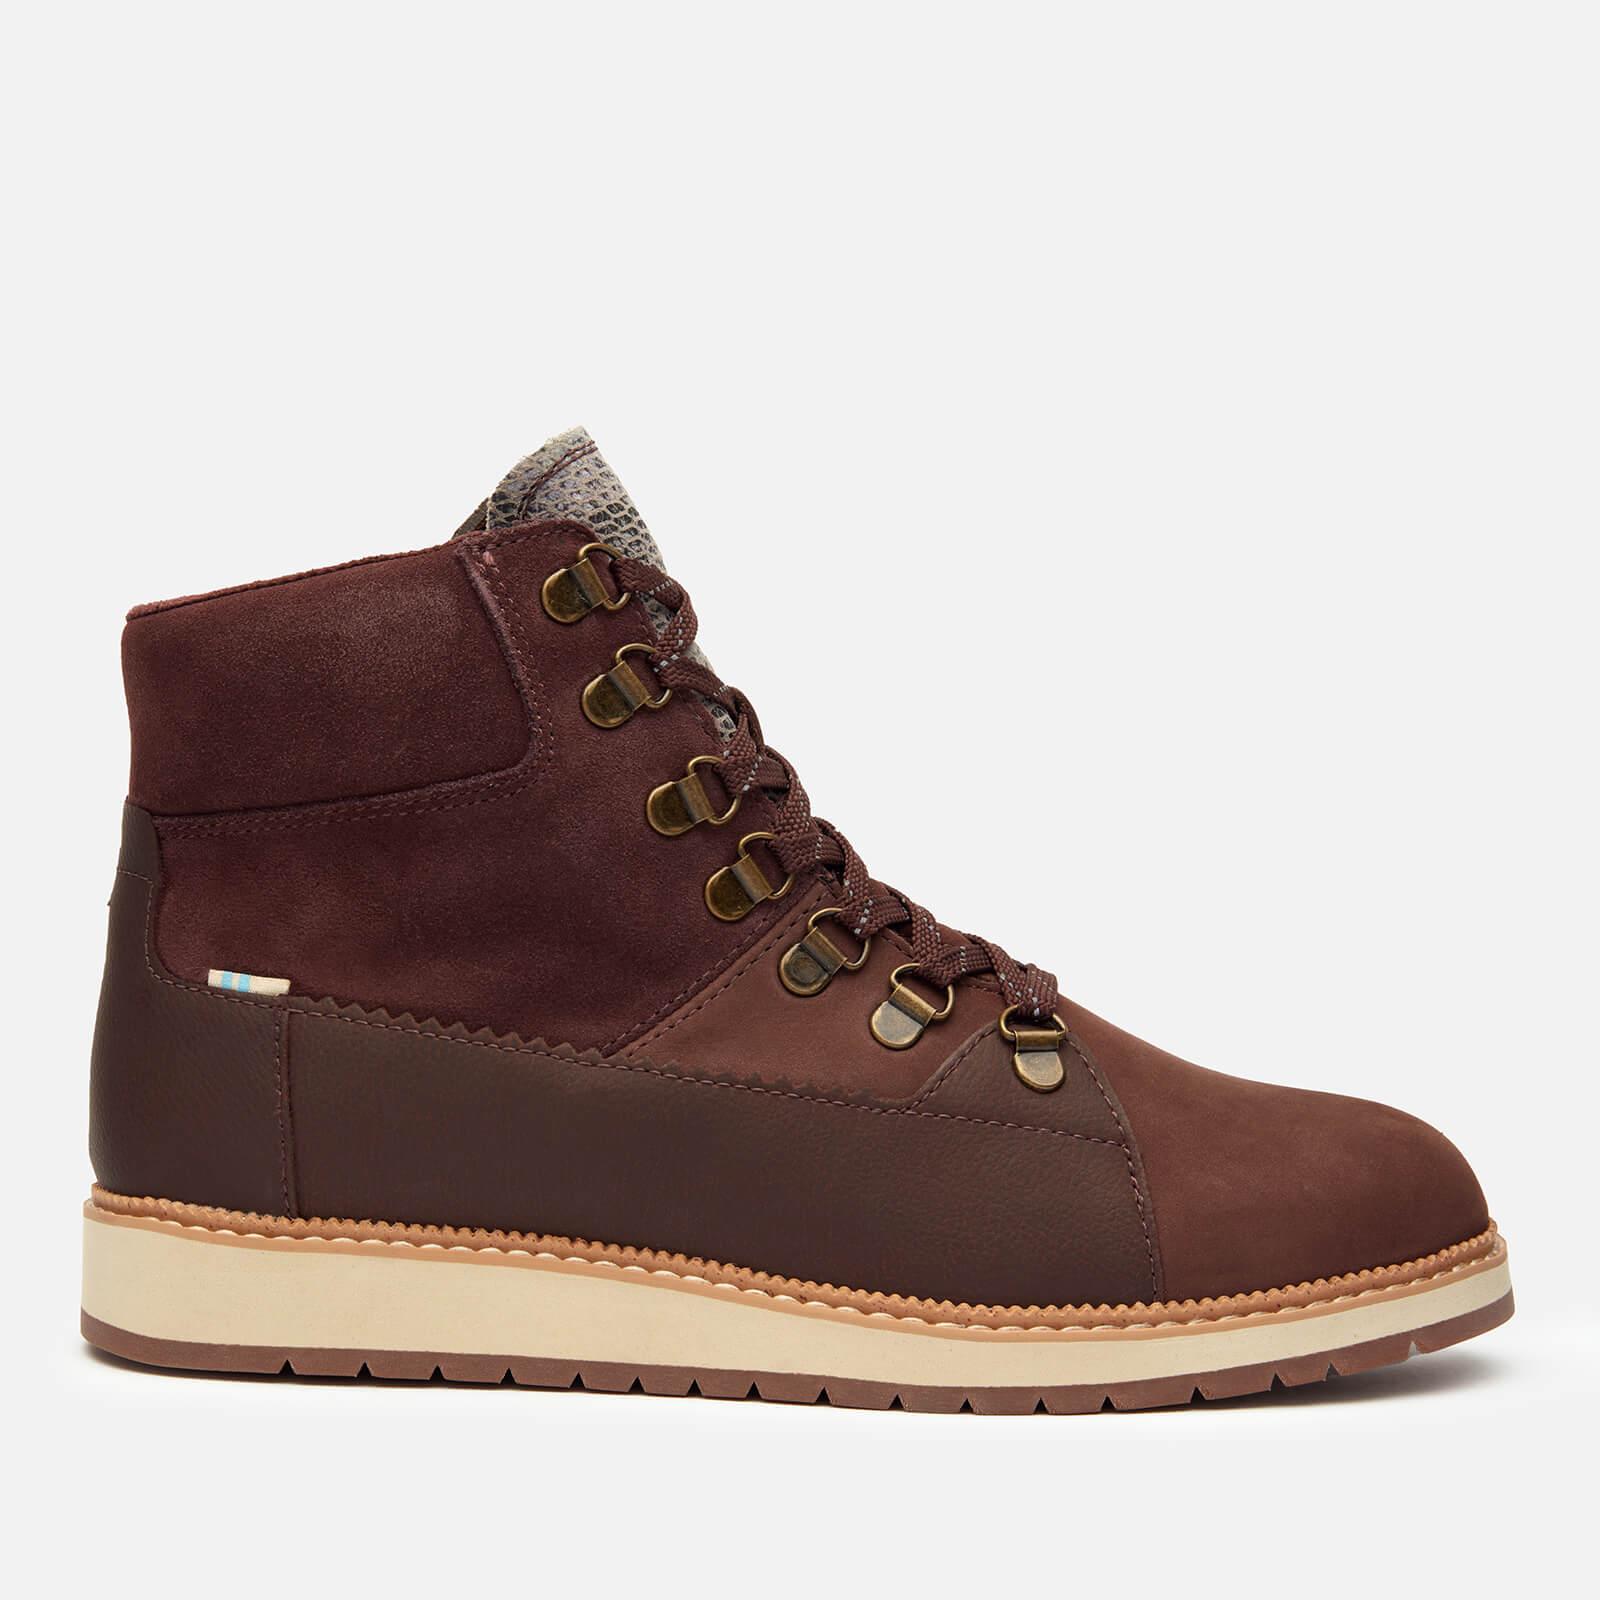 Toms Women's Mesa Waterproof Nubuck Leather Hiking Style Boots - Dark Red - Uk 3